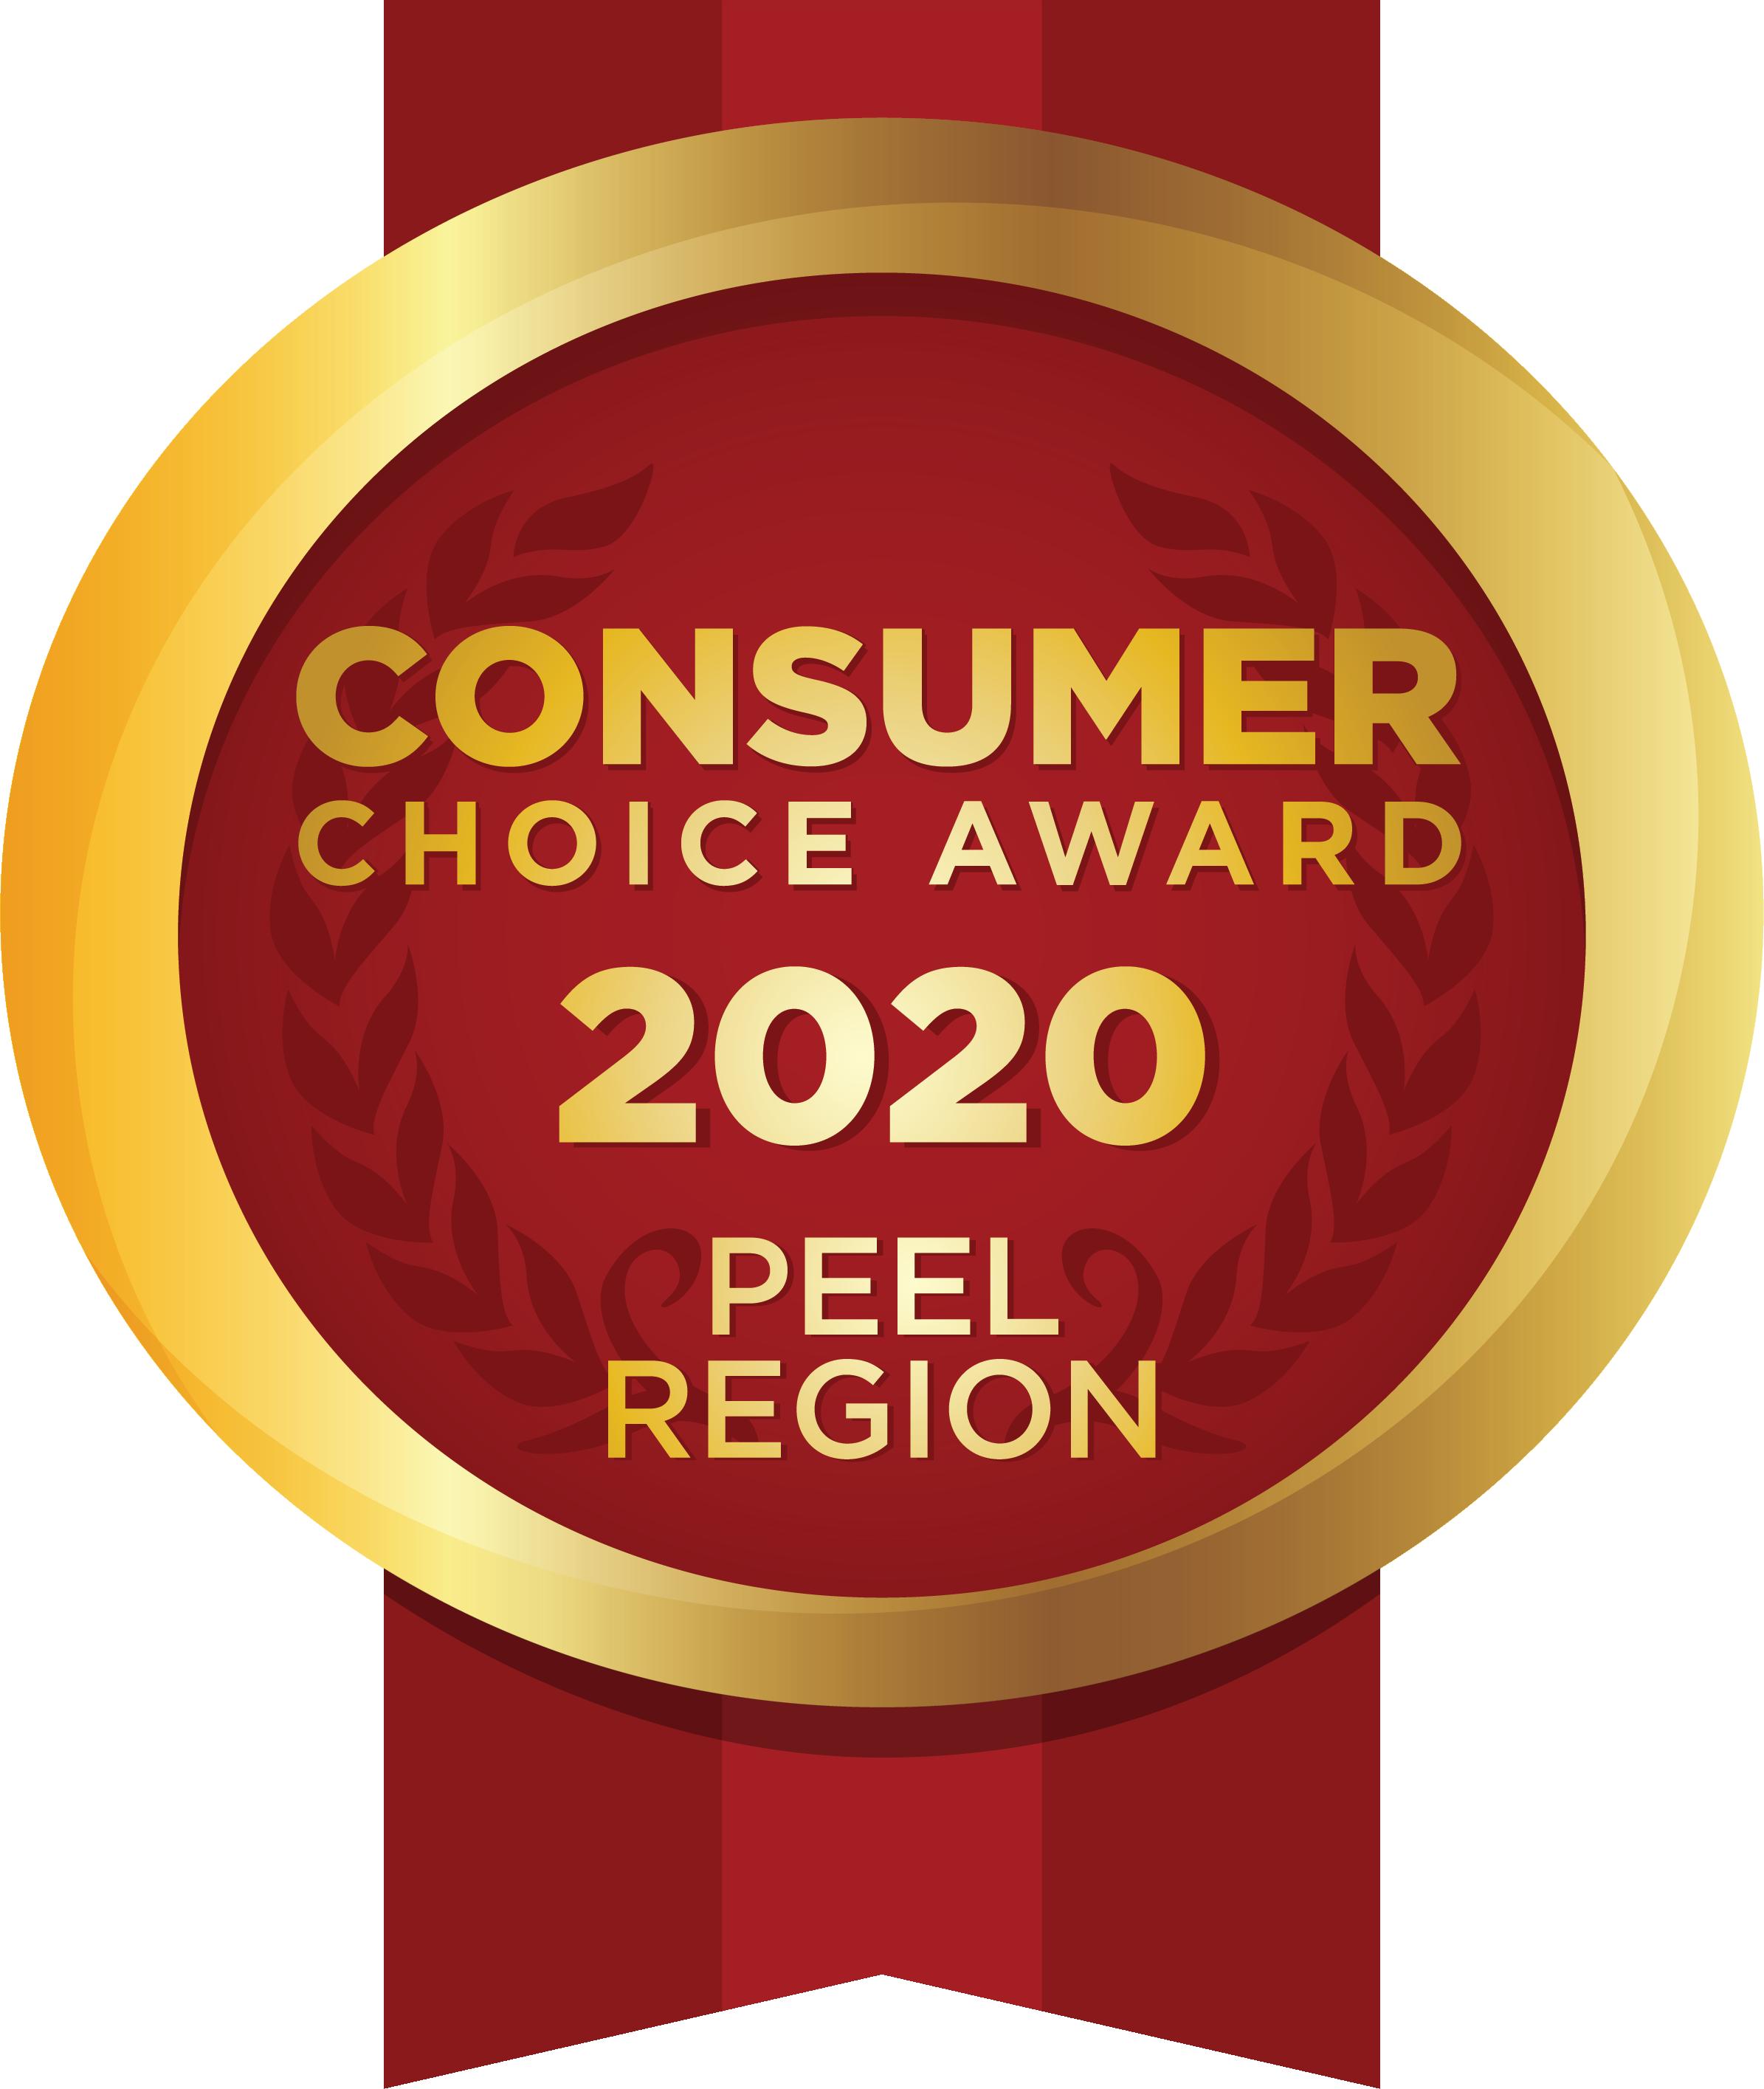 Consumer Choice Award 2020, Peel Region